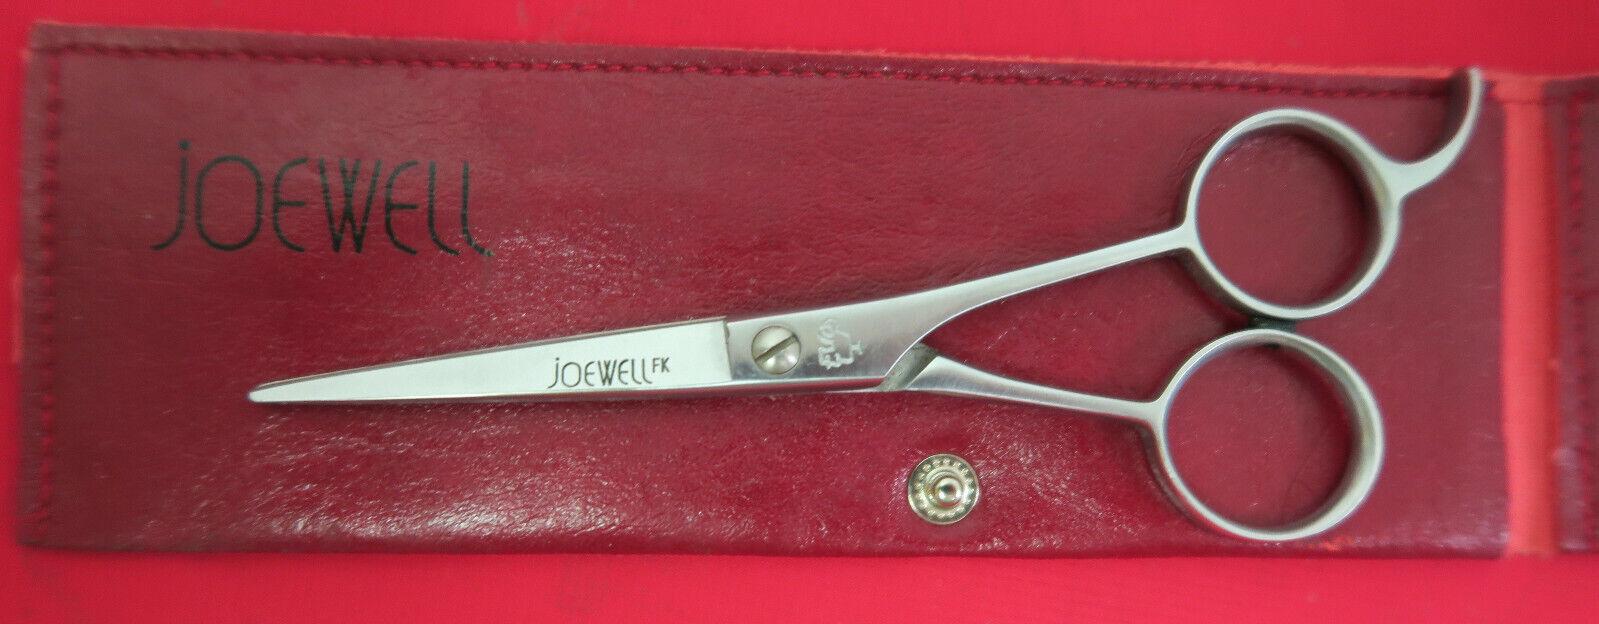 Joewell 50FK Japan Professional Salon Stylist Hair Shears Sc